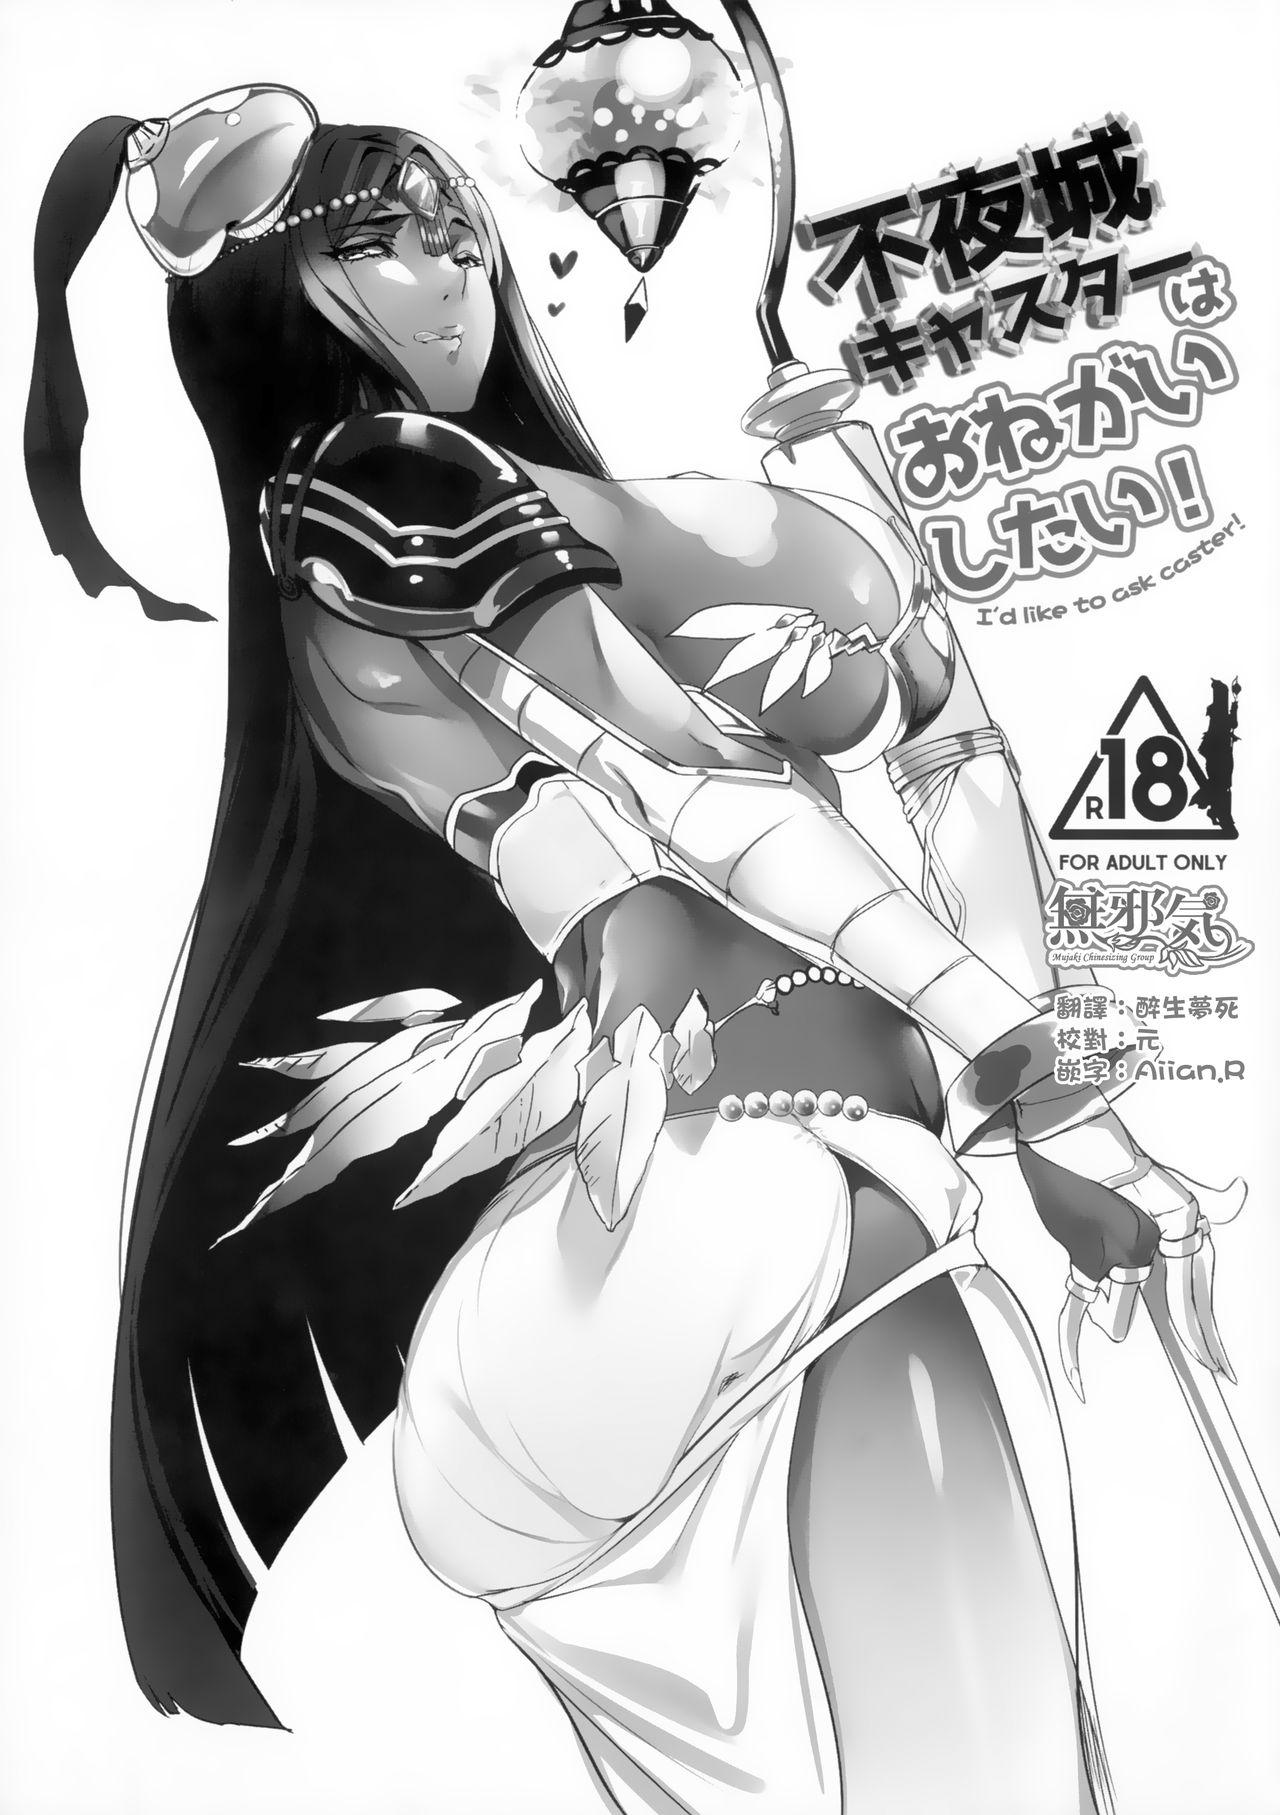 Fuyajou Caster wa Onegai Shitai! - I'd like to ask caster! 0